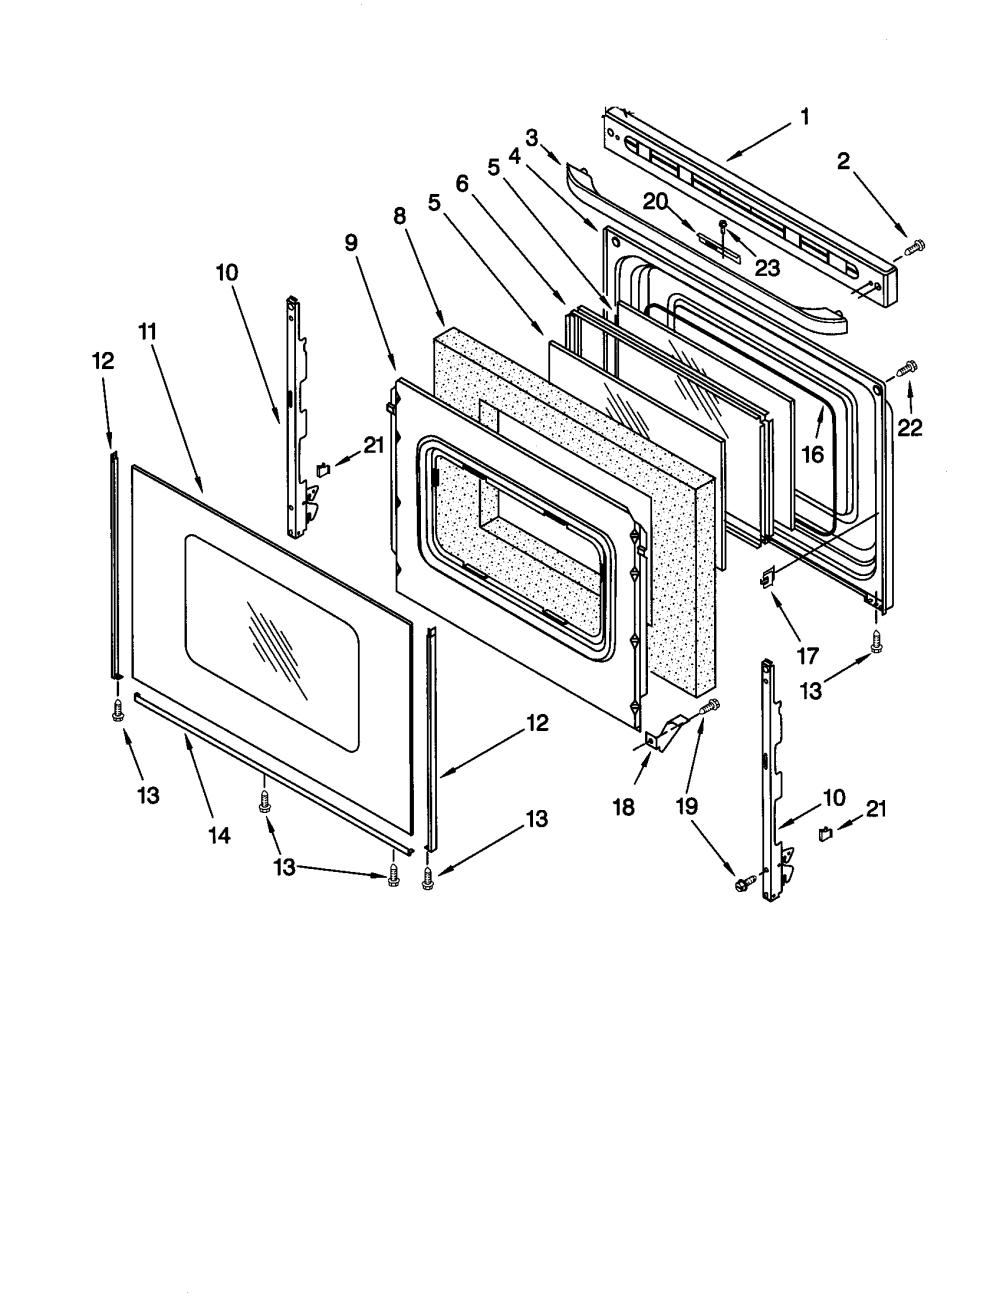 medium resolution of 66595812000 electric range door parts diagram